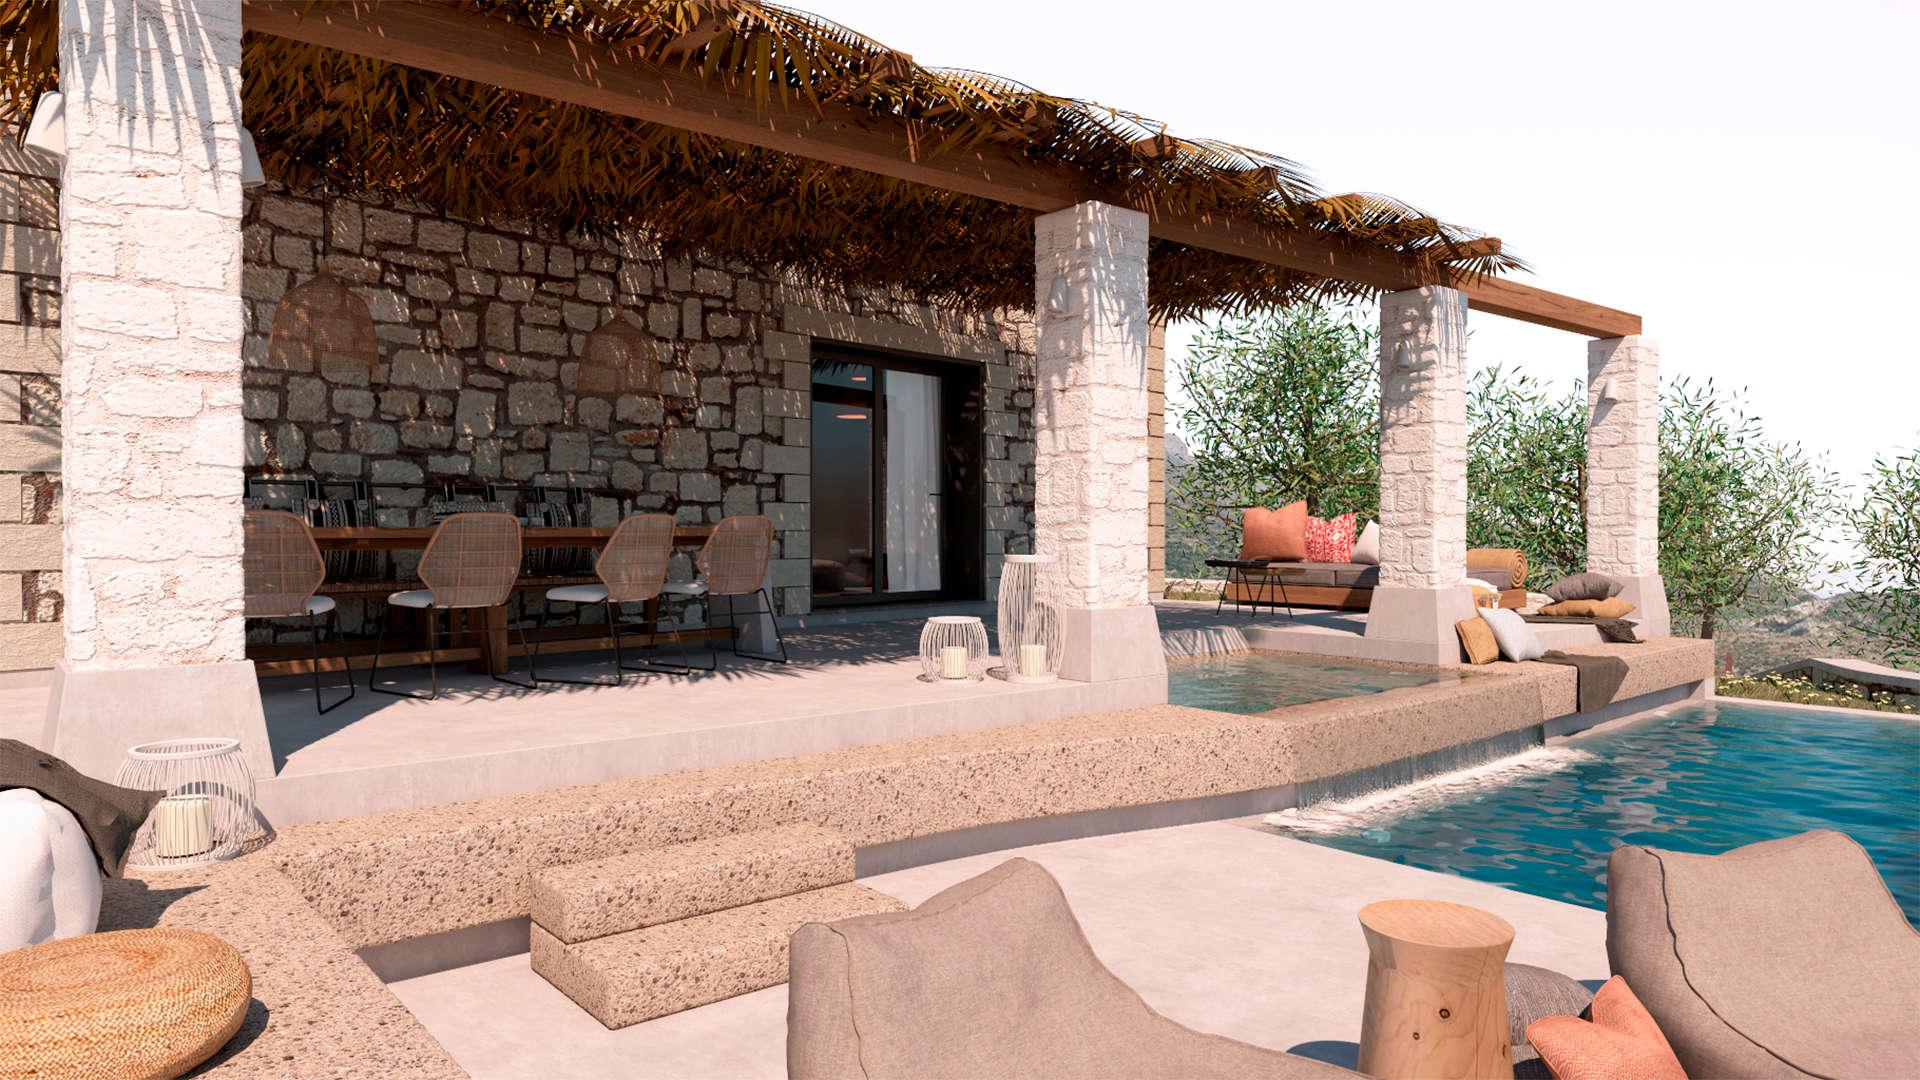 Holiday home, exterior design, pool, poolside, dinning space, Jacuzzi, pergola. Παραθεριστική κατοικία, εξωτερικοί χώροι, πισίνα, τζακούζι, τραπεζαρία, πέργκολα.